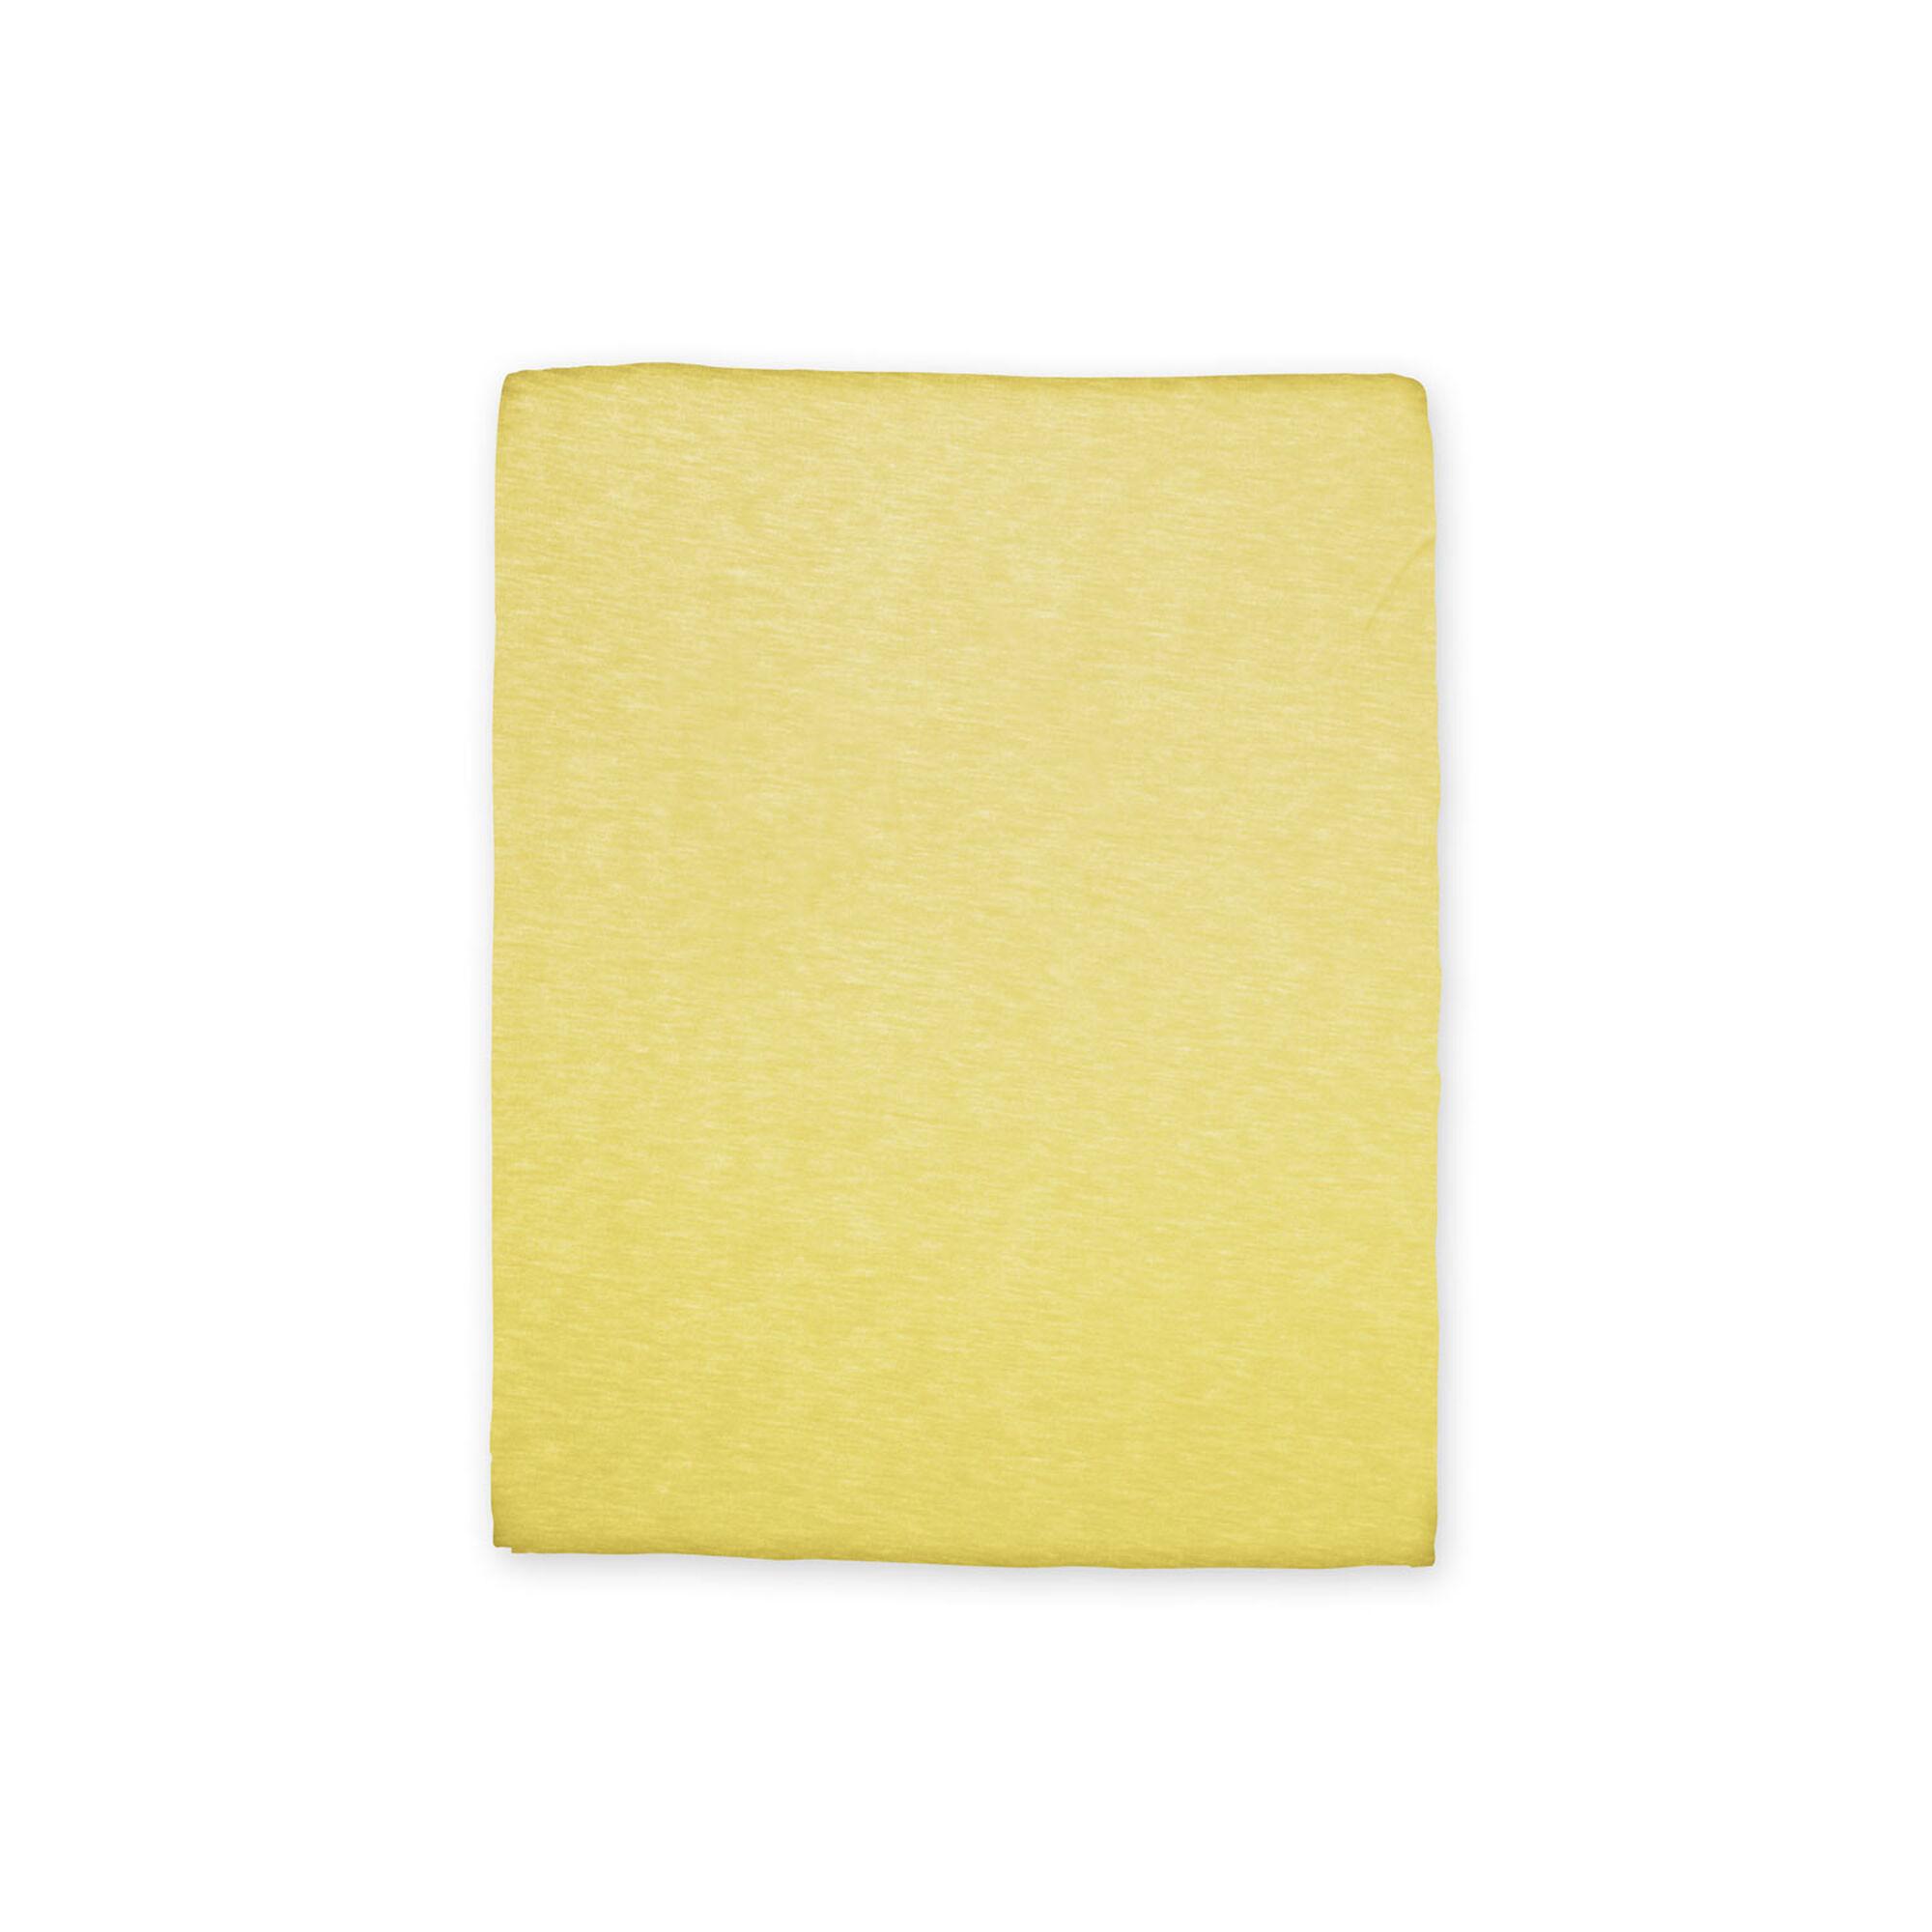 AMEGA SCARF, Dusky Citron, hi-res